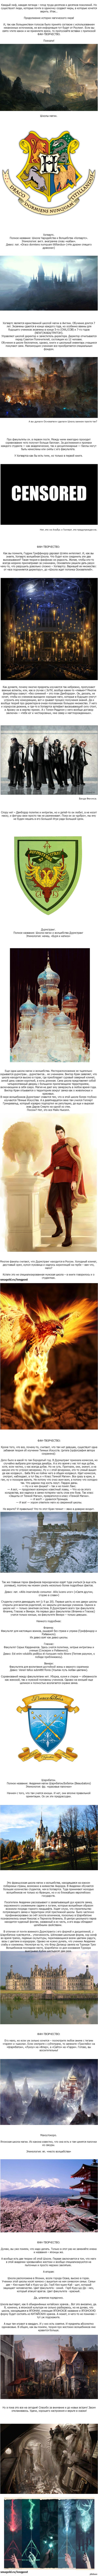 Гарри Поттер: игры Школ